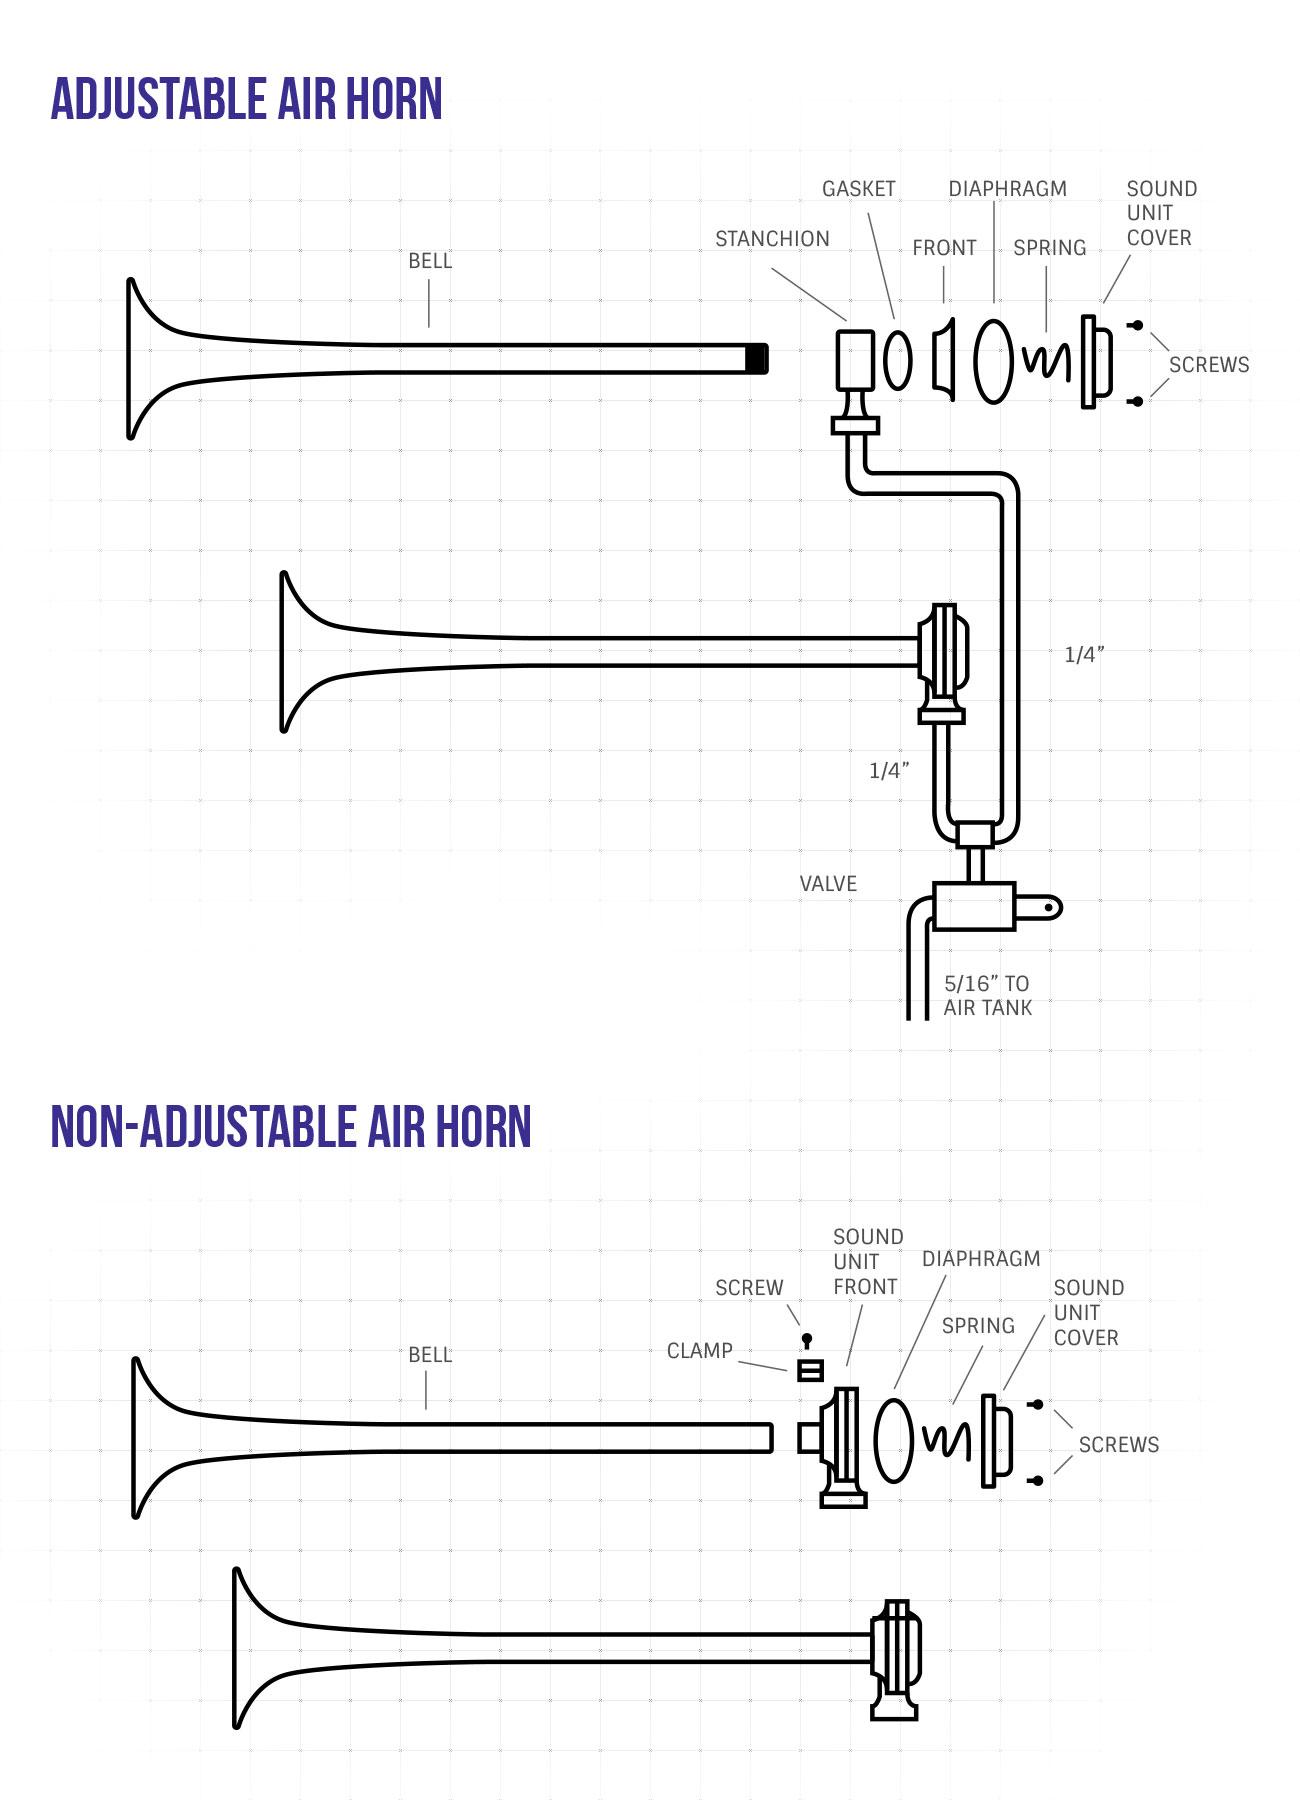 bad boy air horn wiring diagram wiring diagram will be a thing \u2022 12 volt horn harbor freight air horn wiring diagram 38 wiring diagram 05 mustang horn wiring diagram bad boy